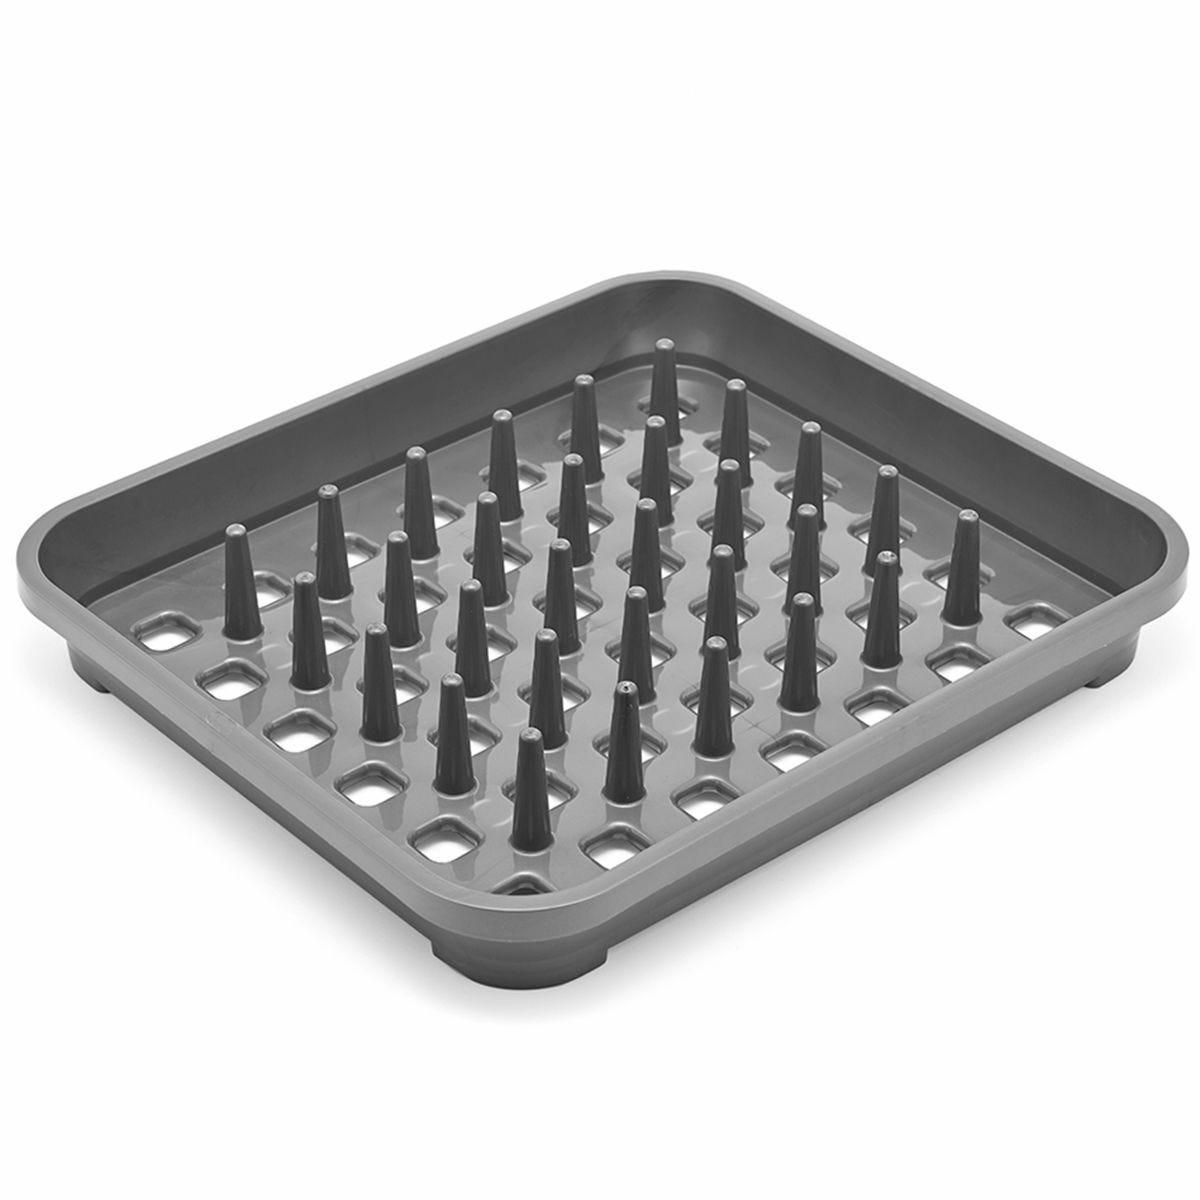 Addis Plastic Dish Drainer - Metallic Grey